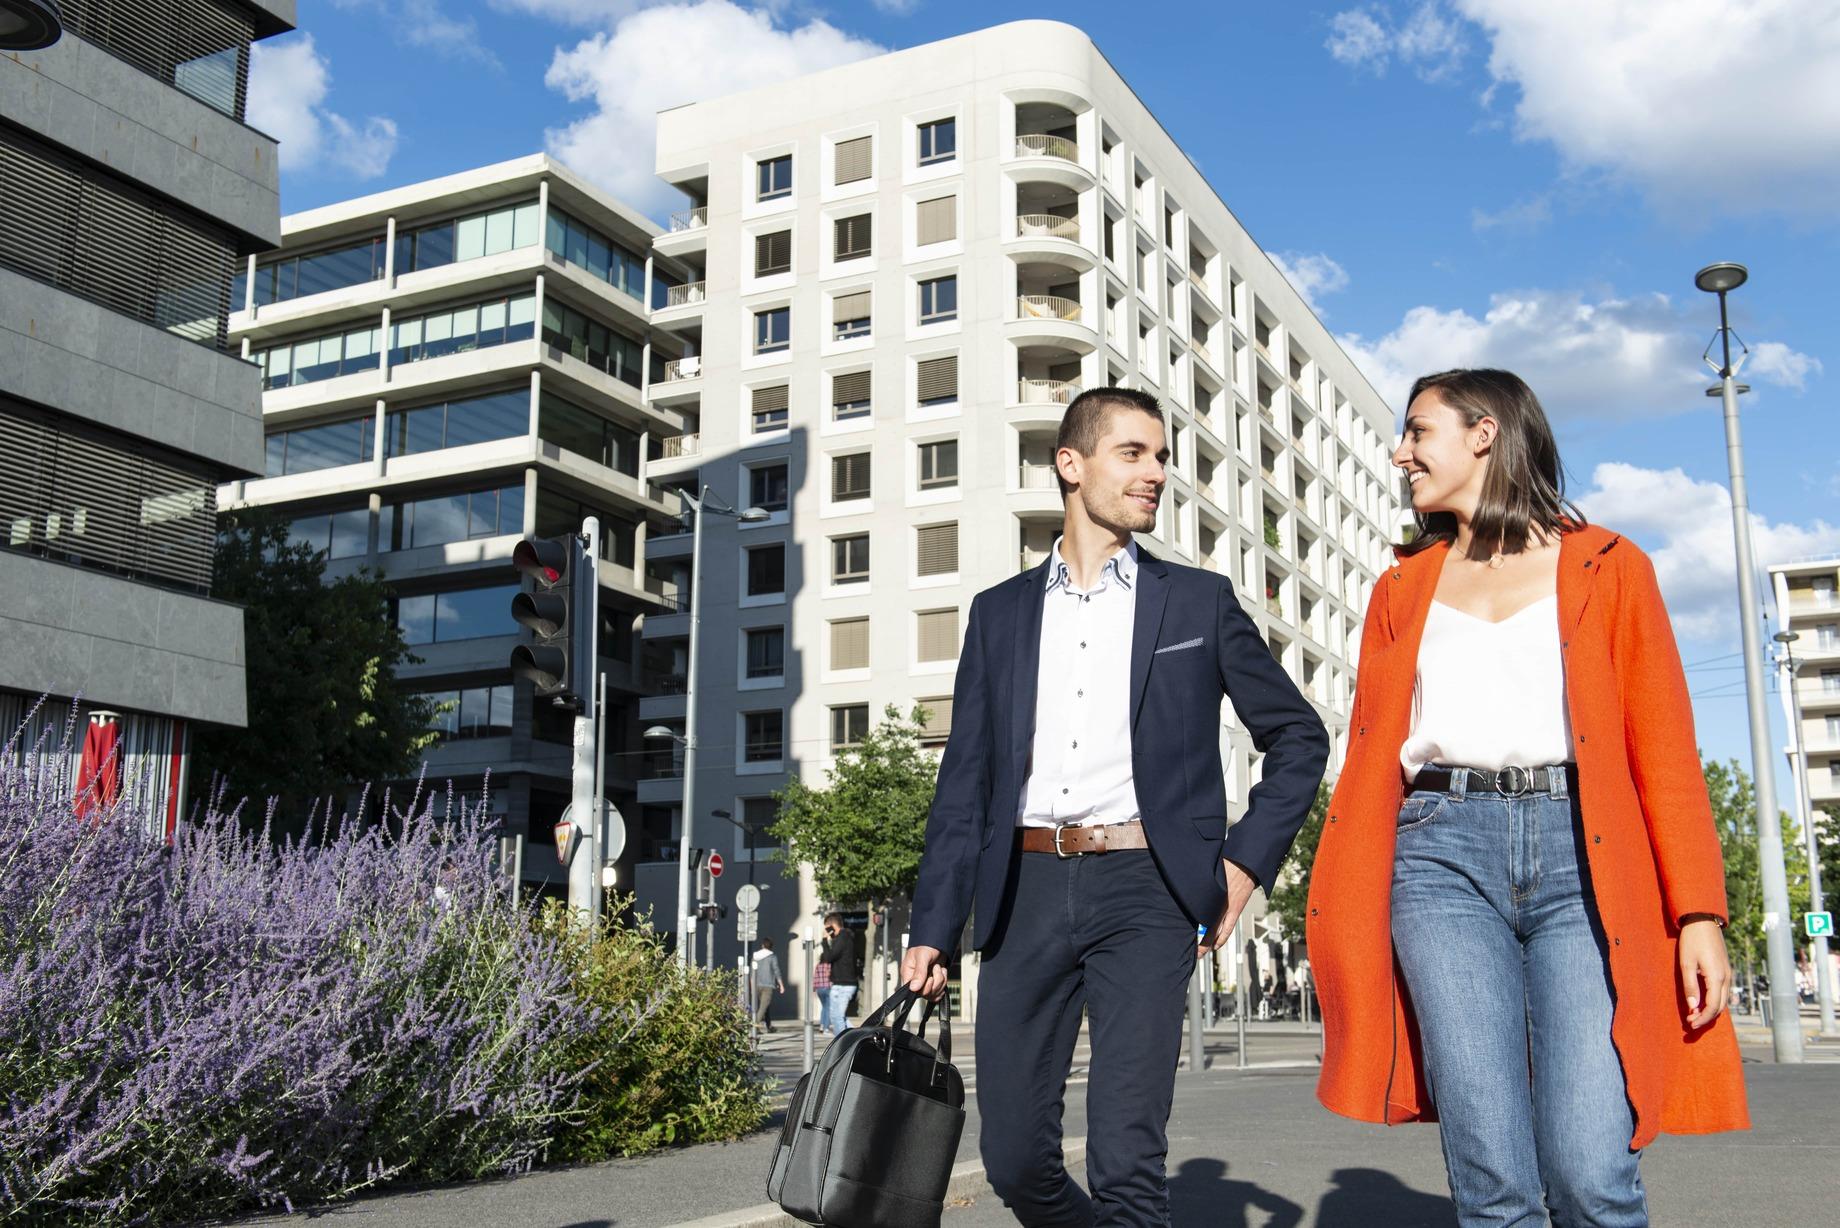 euridis-ecole-commerce-vente-negociation-BtoB- digital-business-18-min